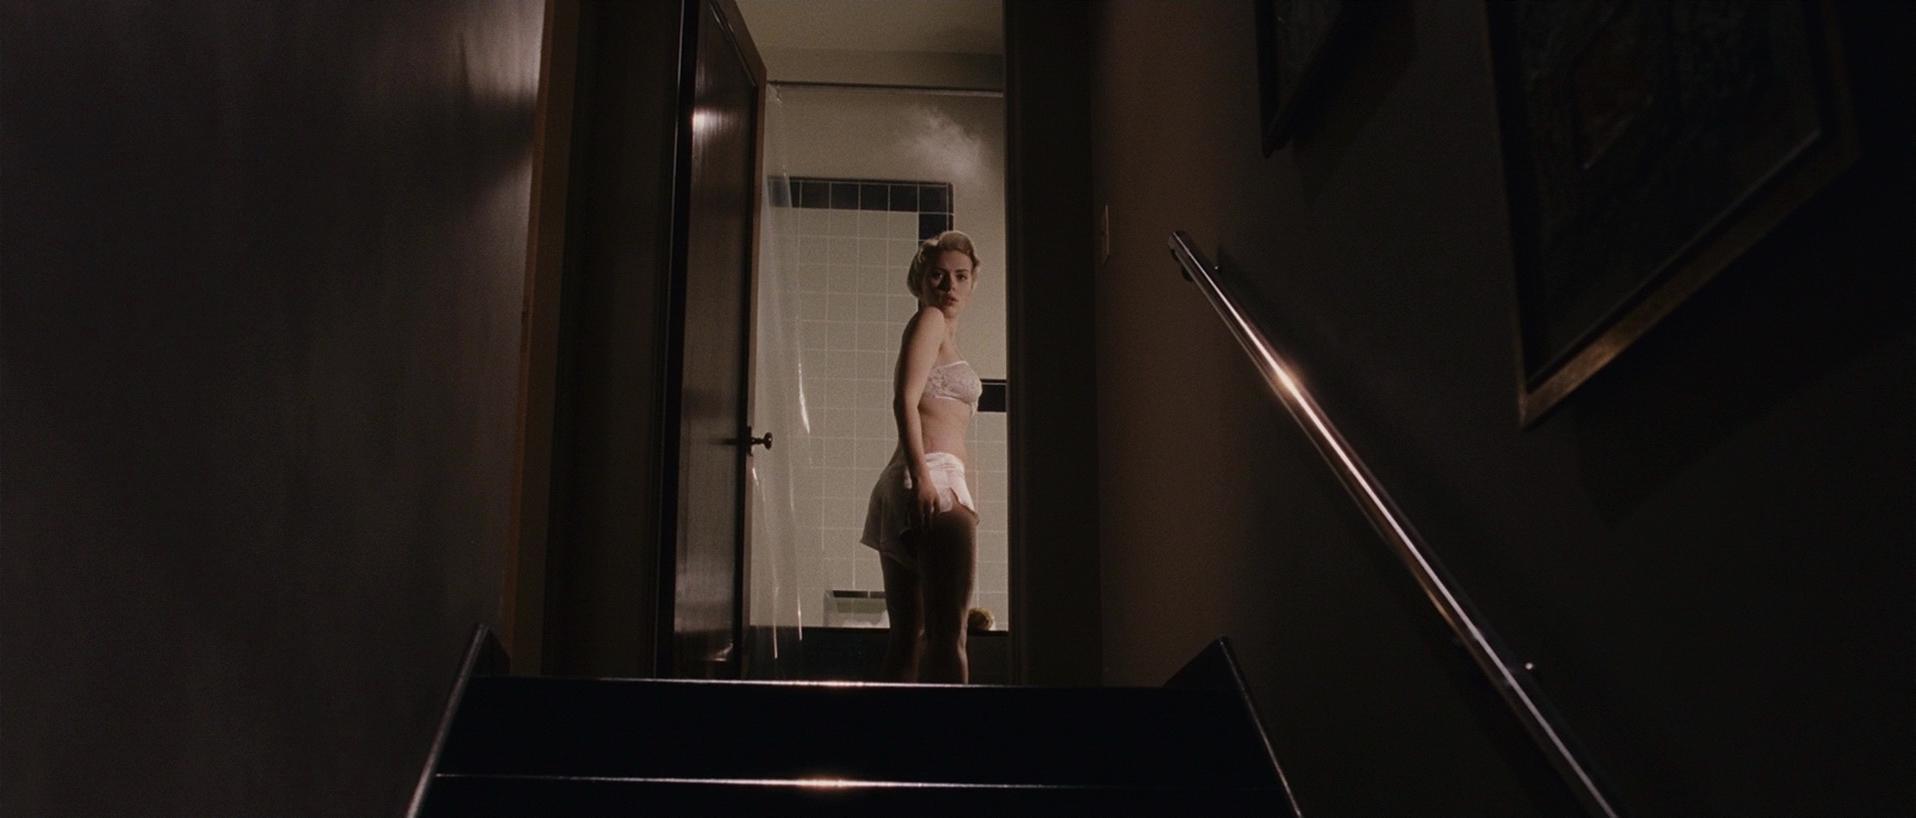 Scarlett Johansson sexy - The Black Dahlia (2006)